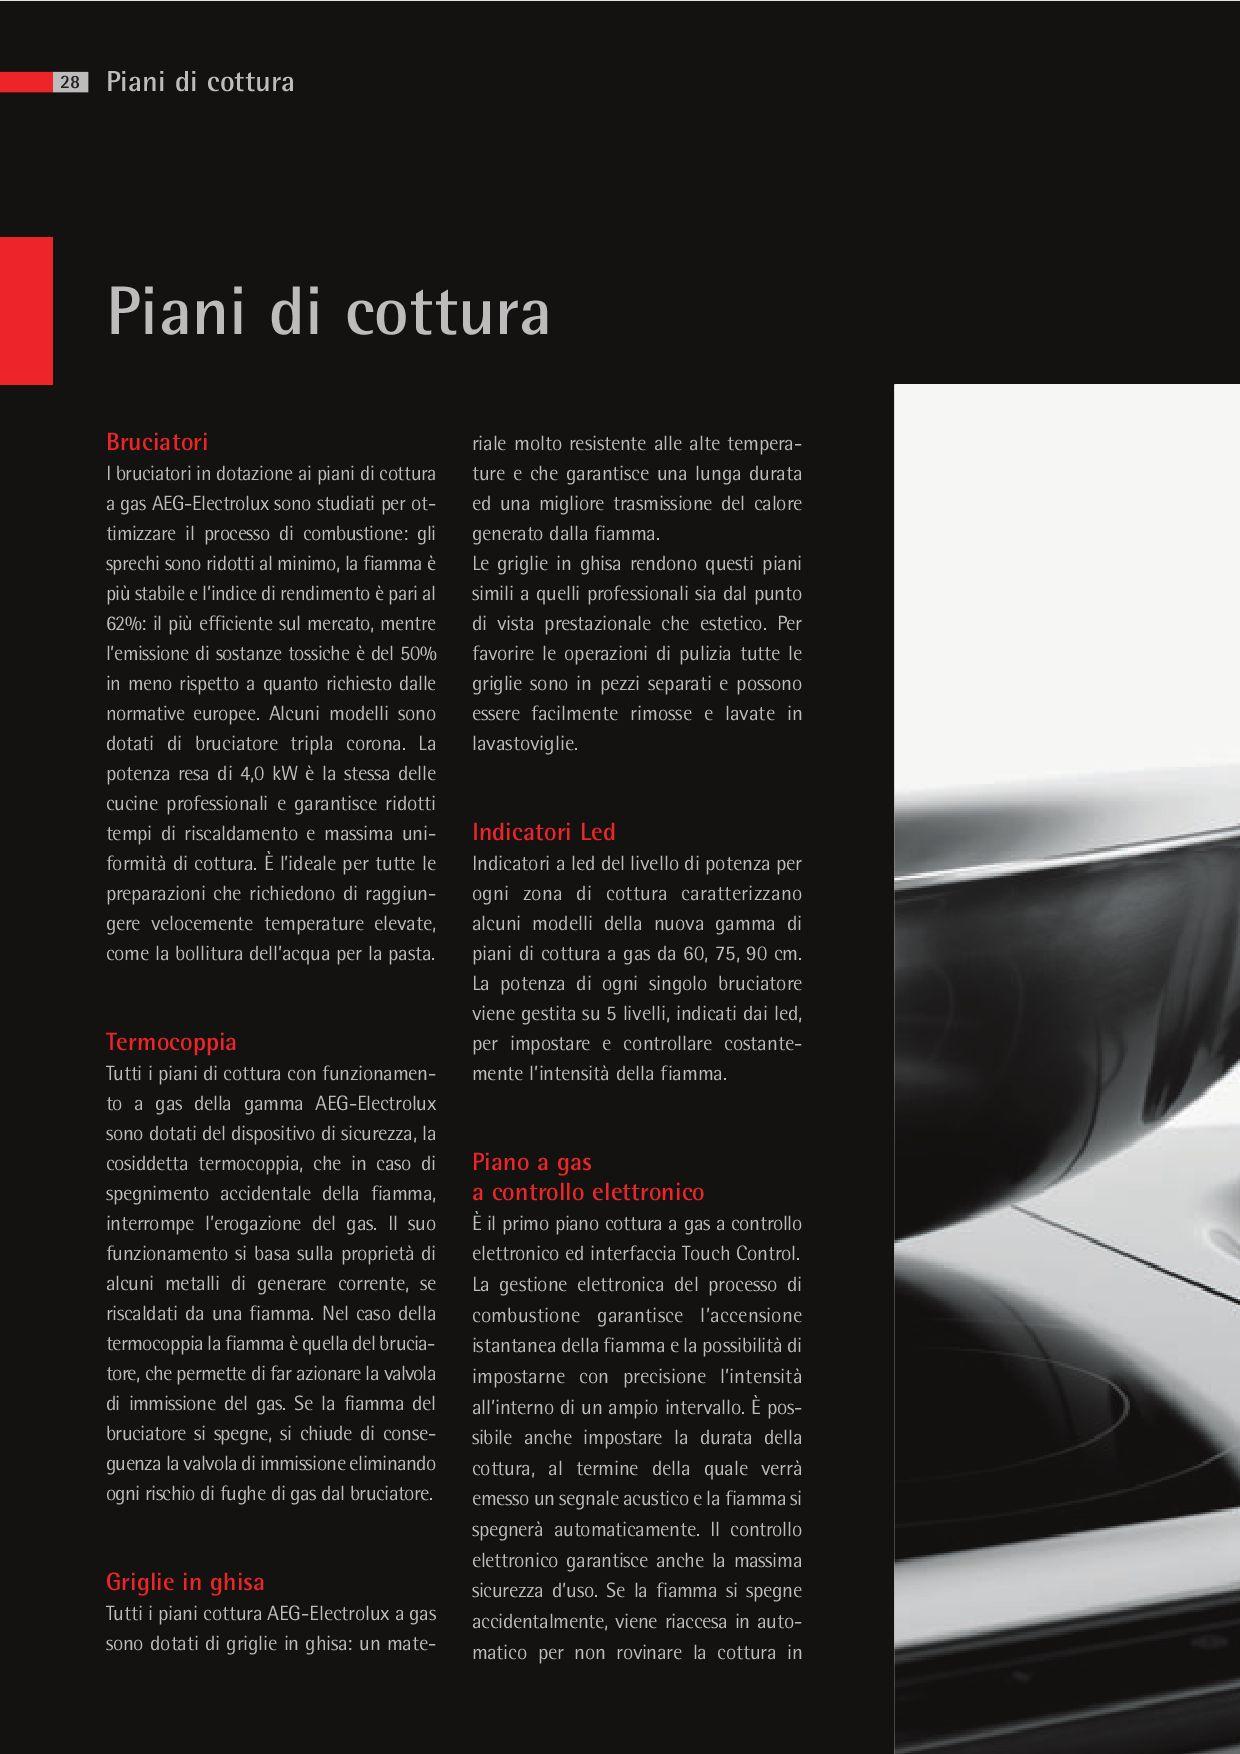 piani cottura aeg by Carmine Barbato - issuu